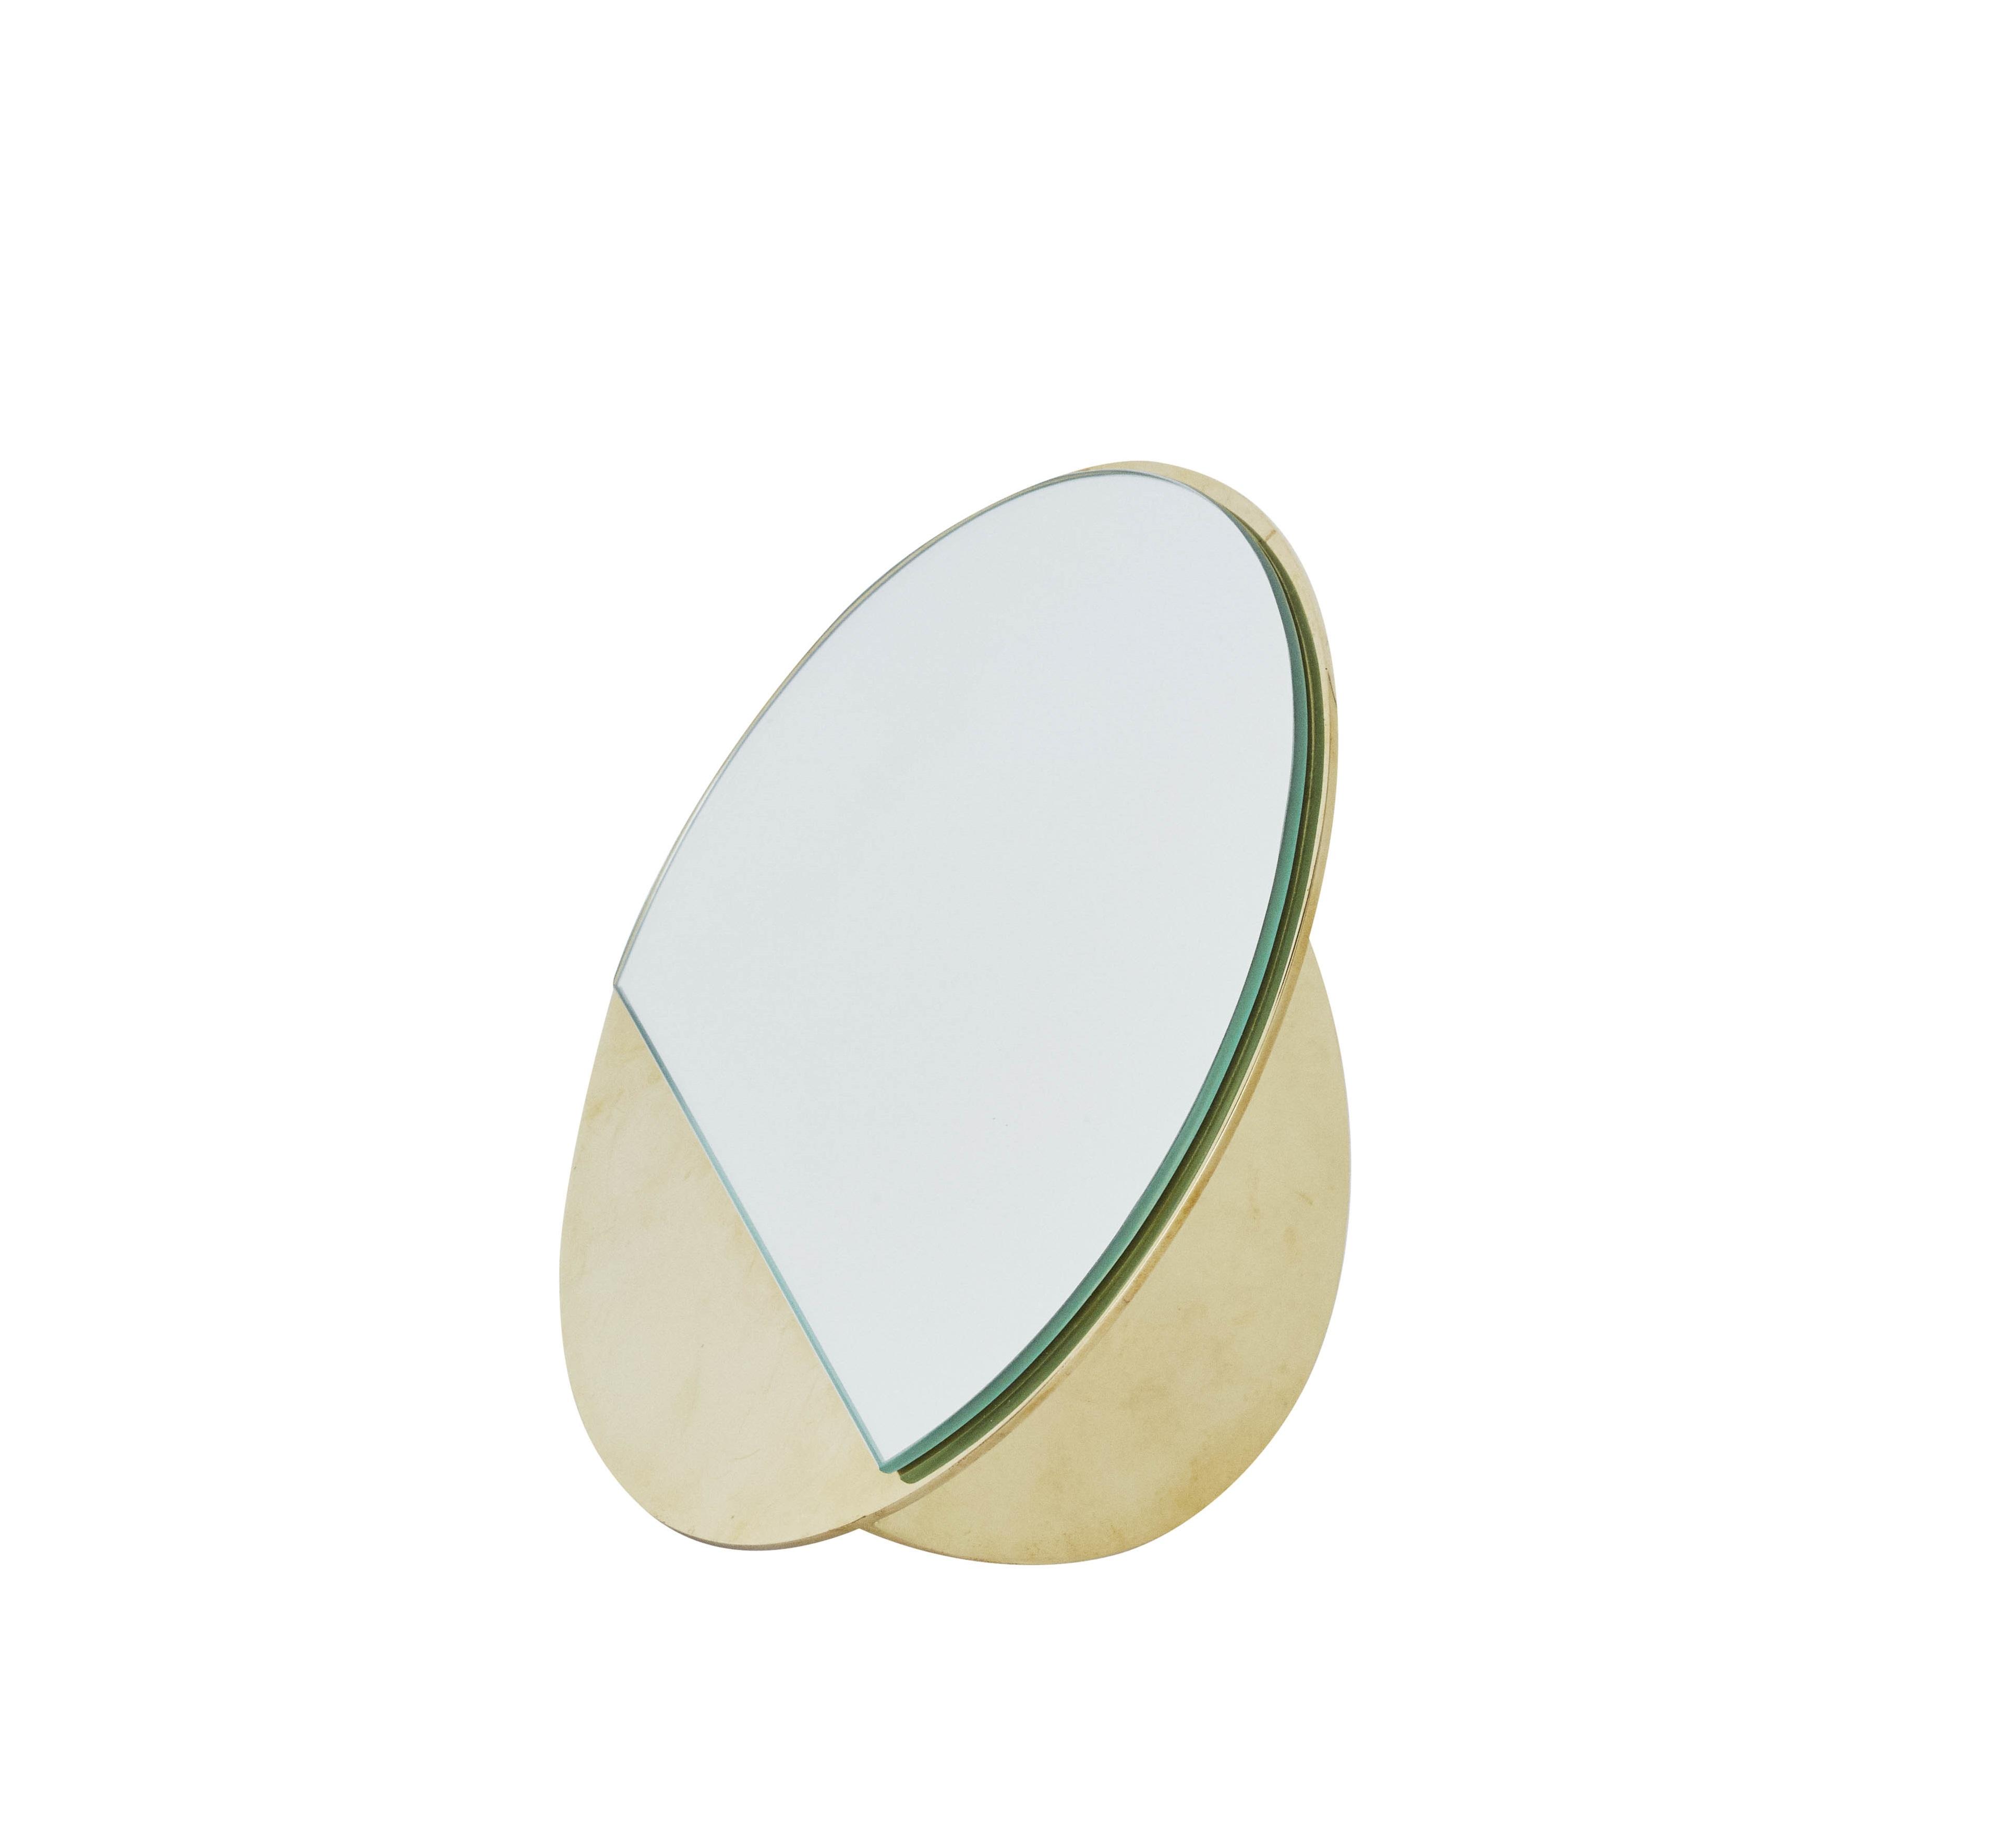 Kristina dam mässing spegel